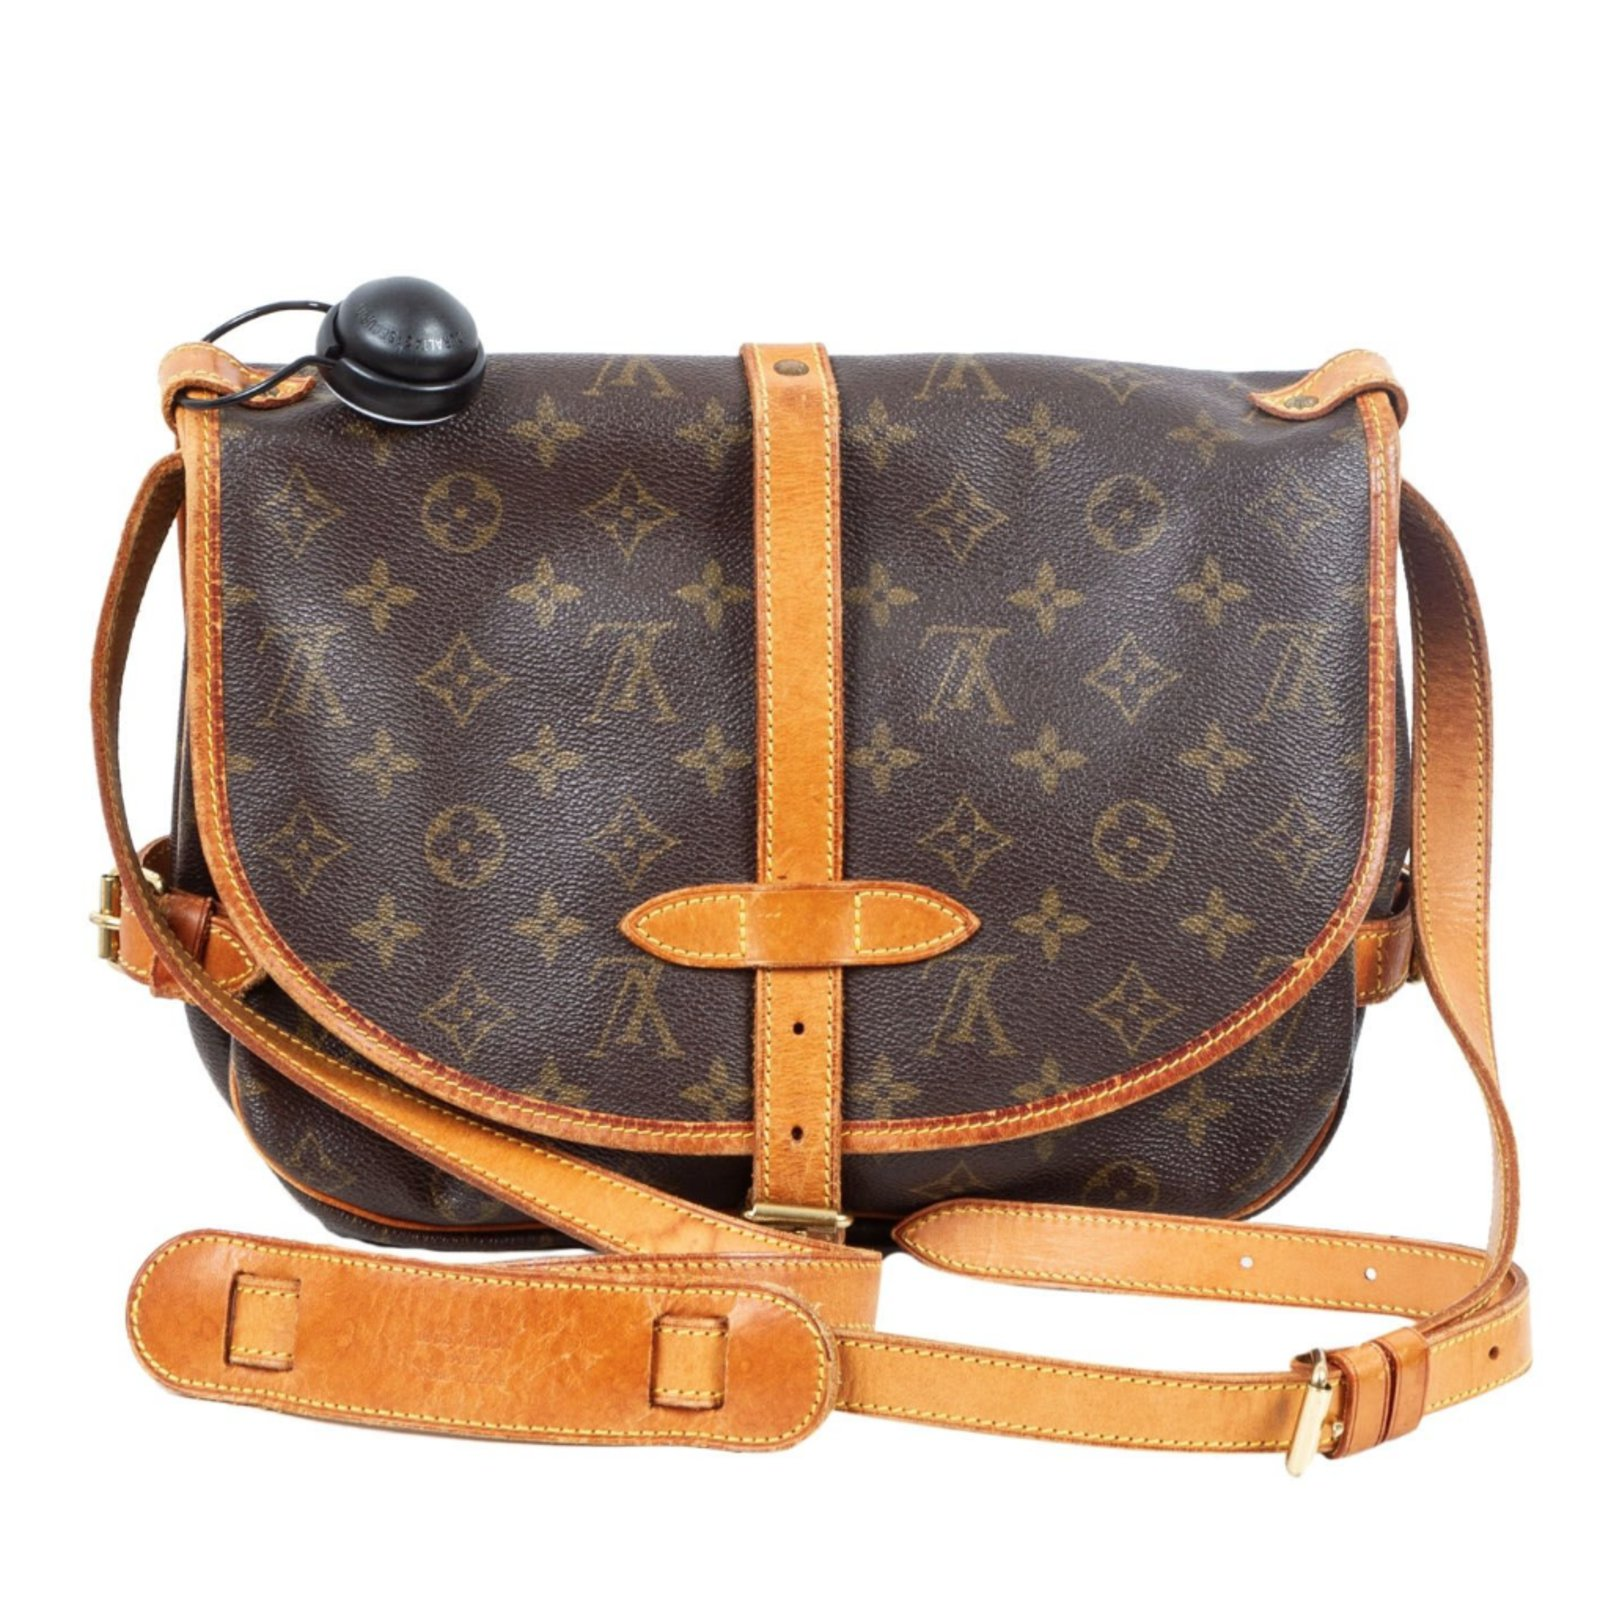 43db2b82bf09 Louis Vuitton Saumur 30 - vintage Handbags Leather